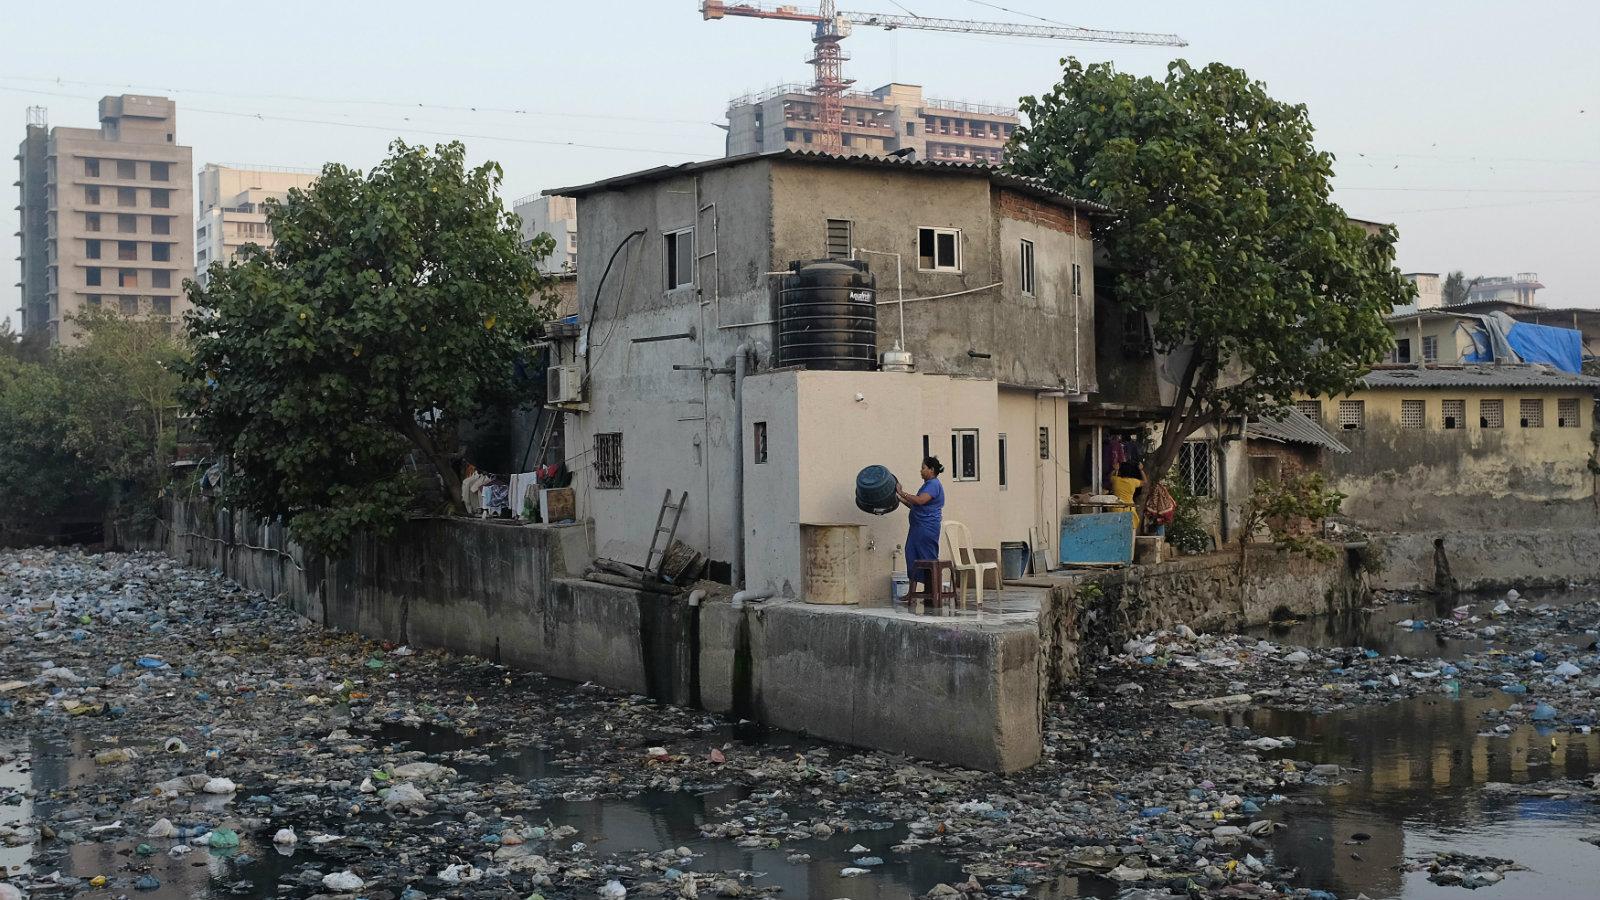 india-toilets-waste-management